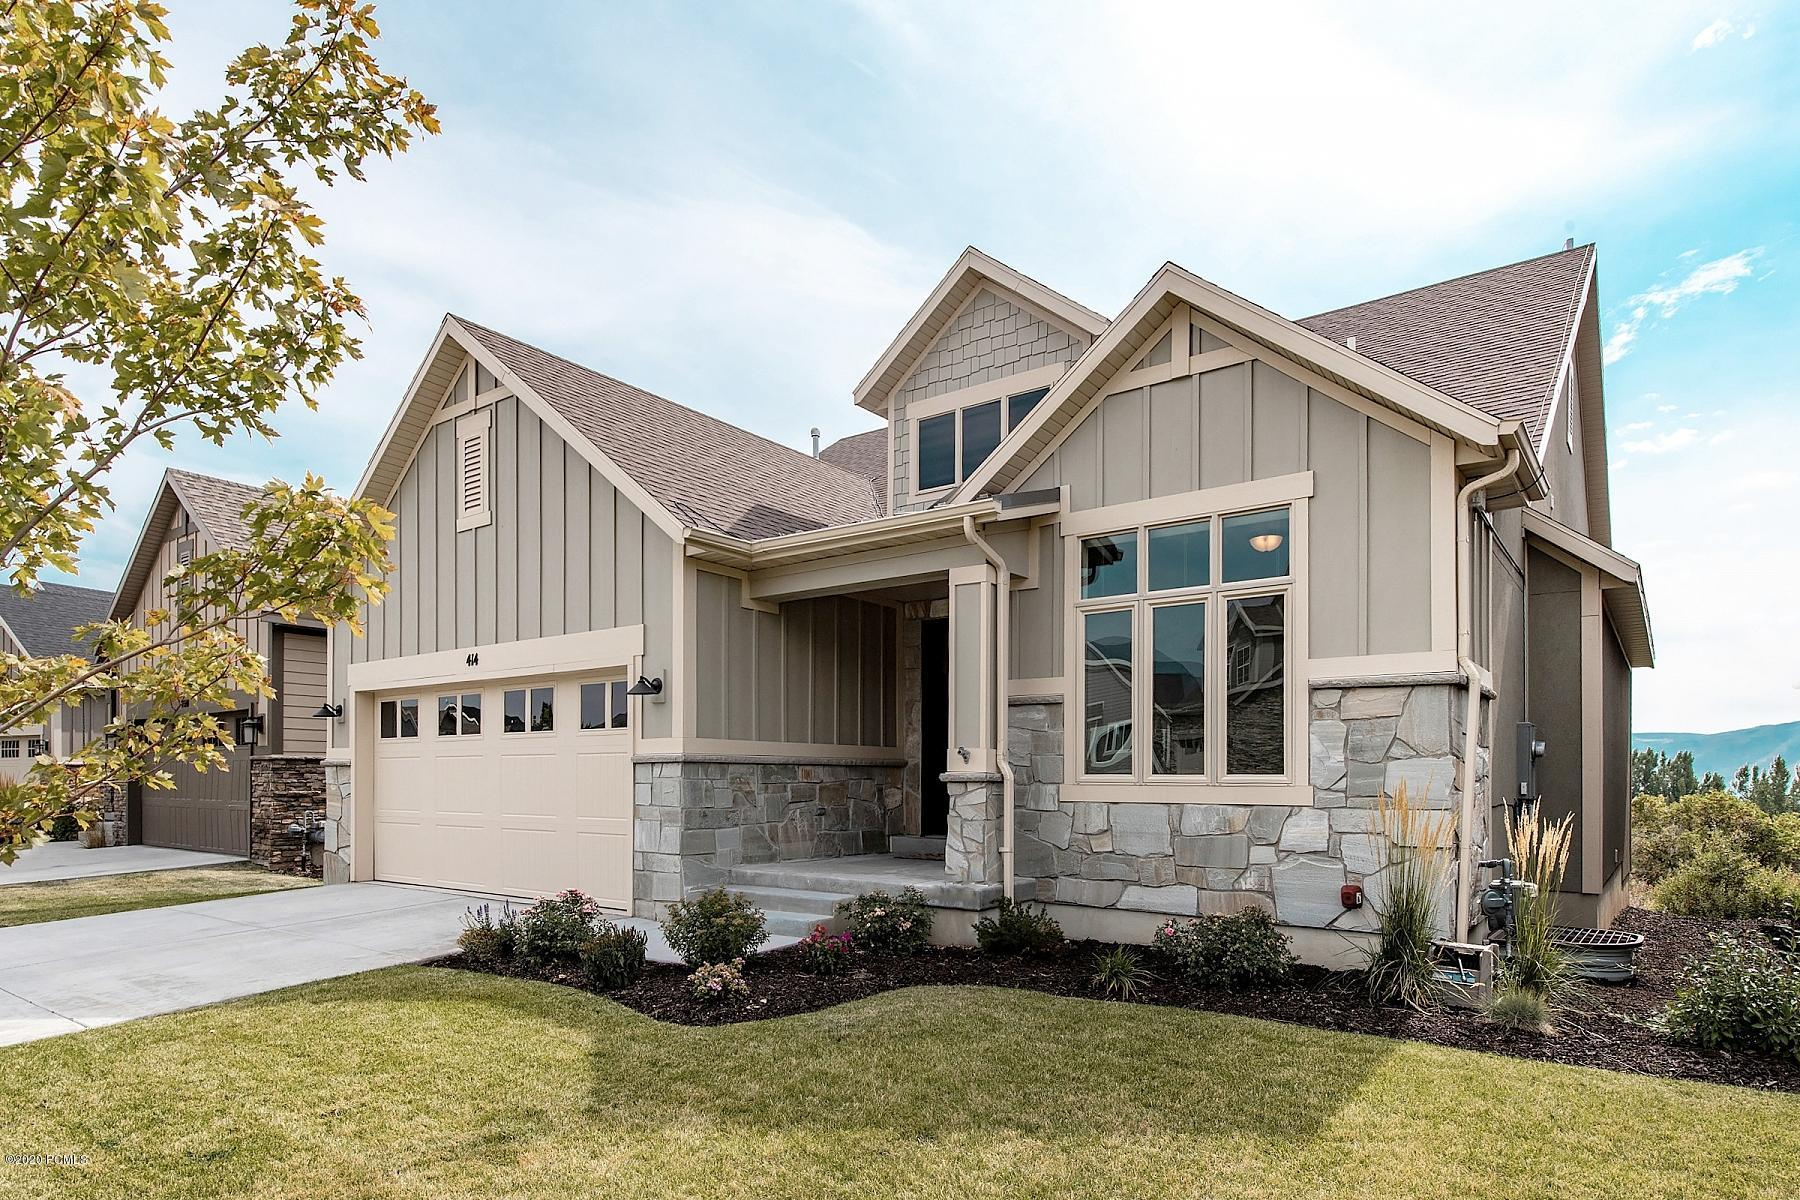 414 Fairway Drive, Midway, Utah 84049, 4 Bedrooms Bedrooms, ,3 BathroomsBathrooms,Single Family,For Sale,Fairway,12003621